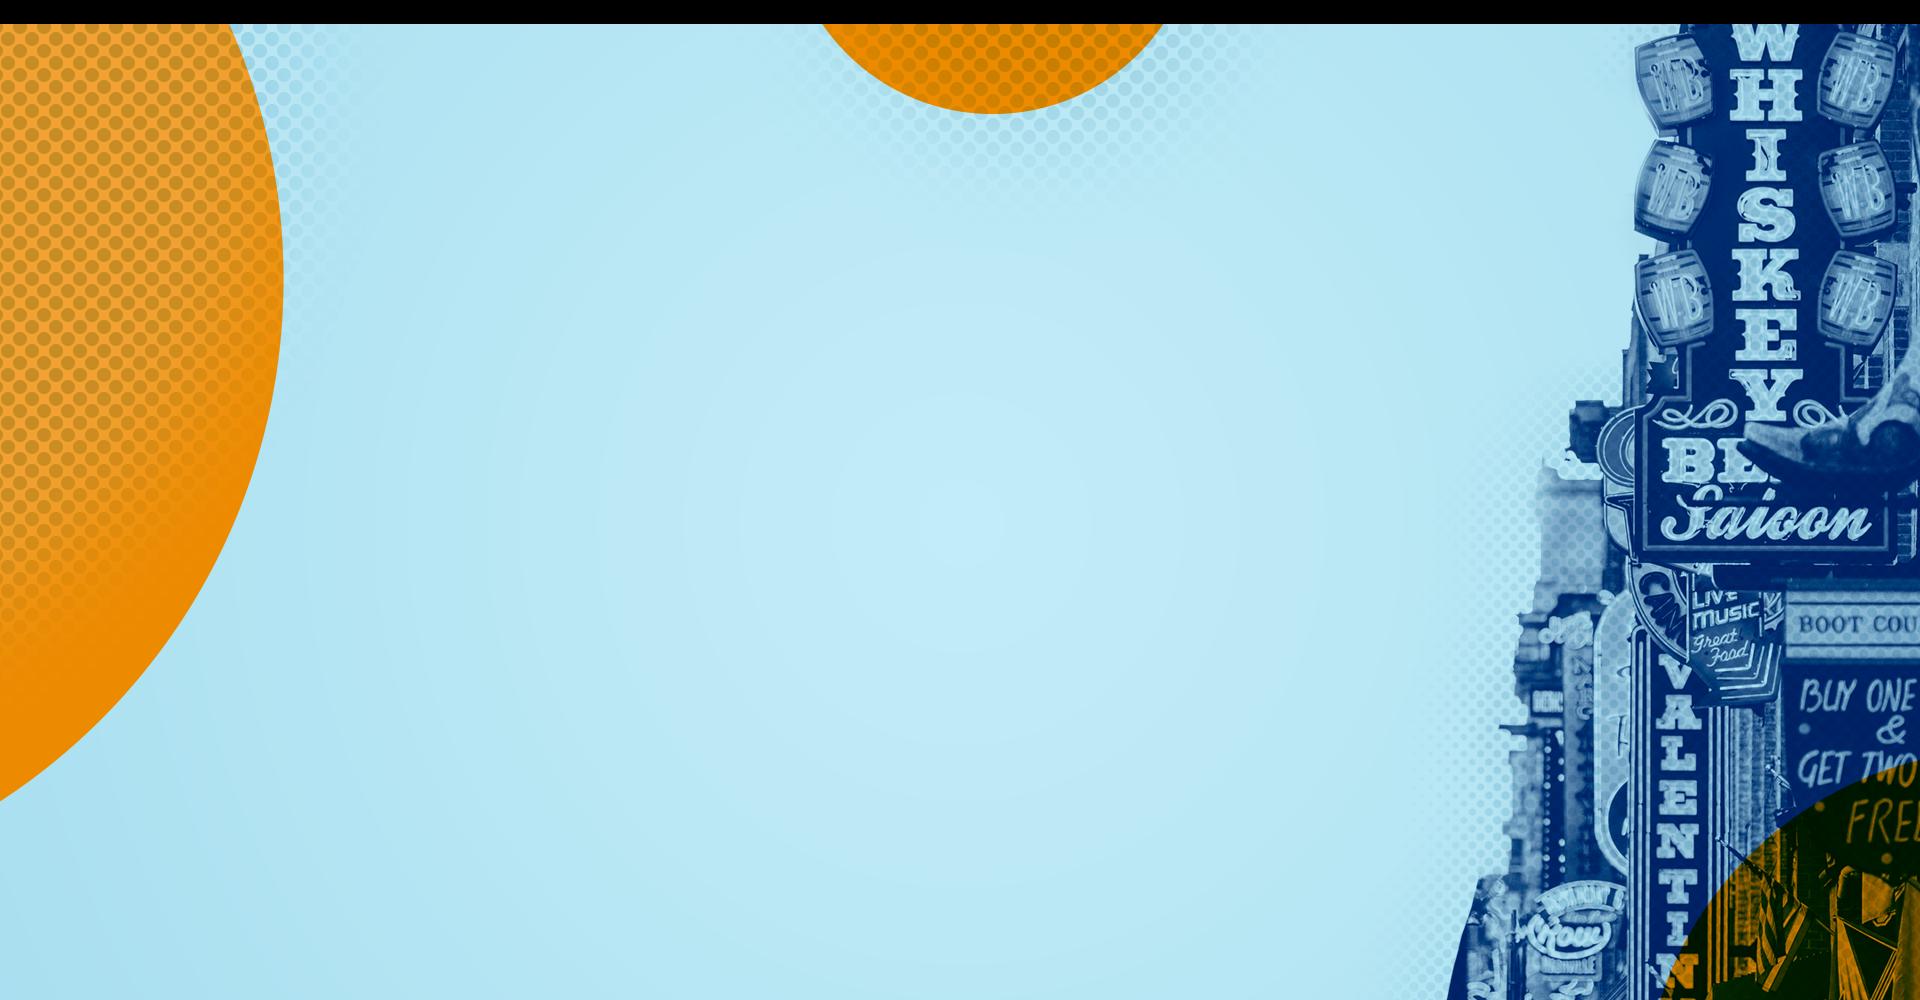 msx header background